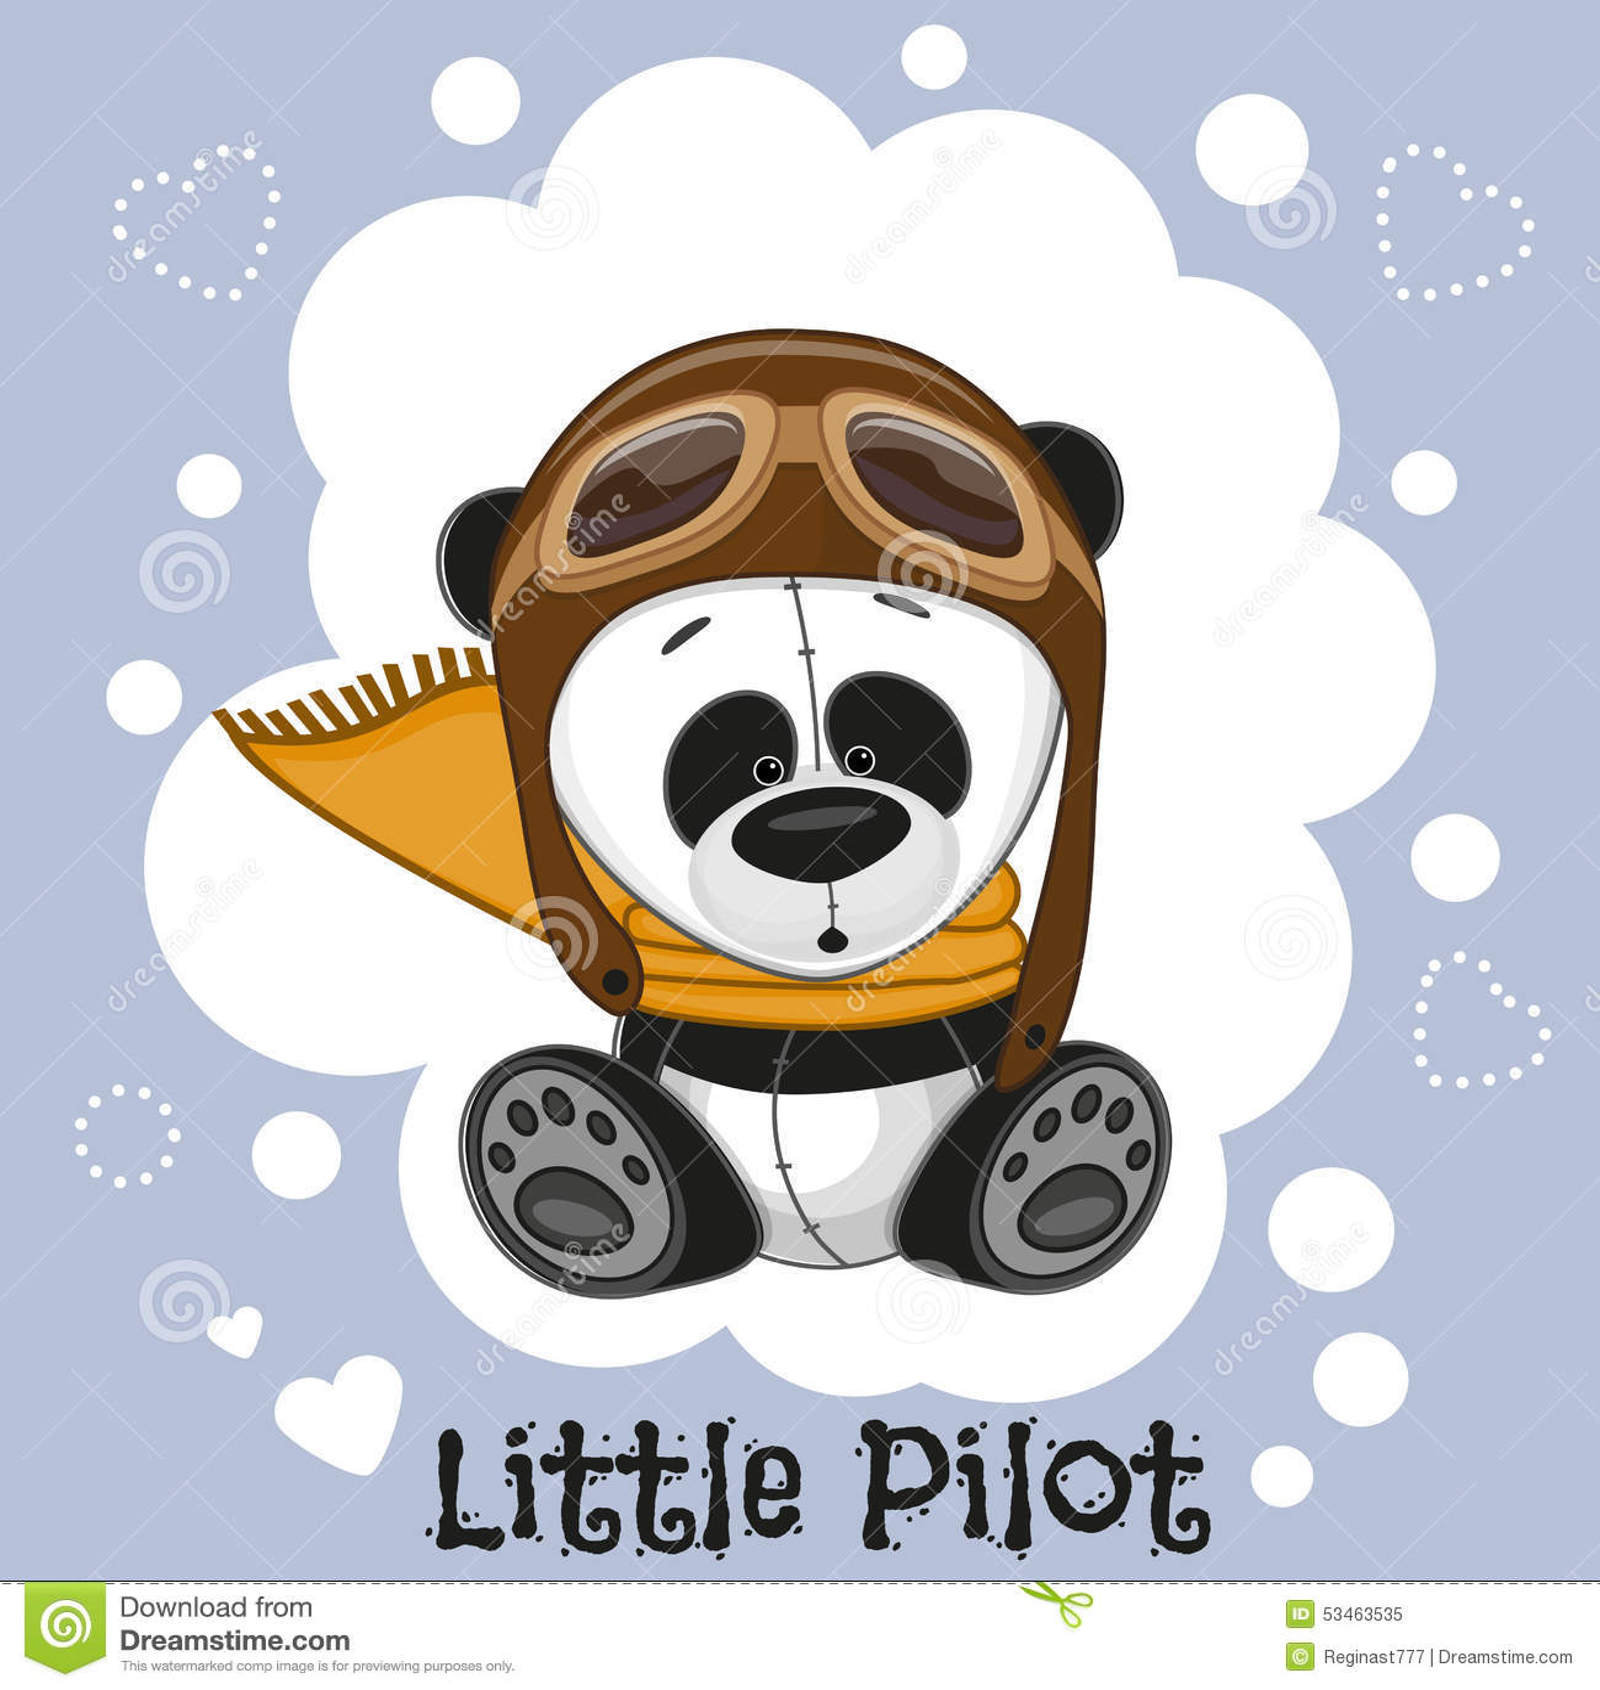 84bab6a644 Little Pilot stock vector. Illustration of glasses